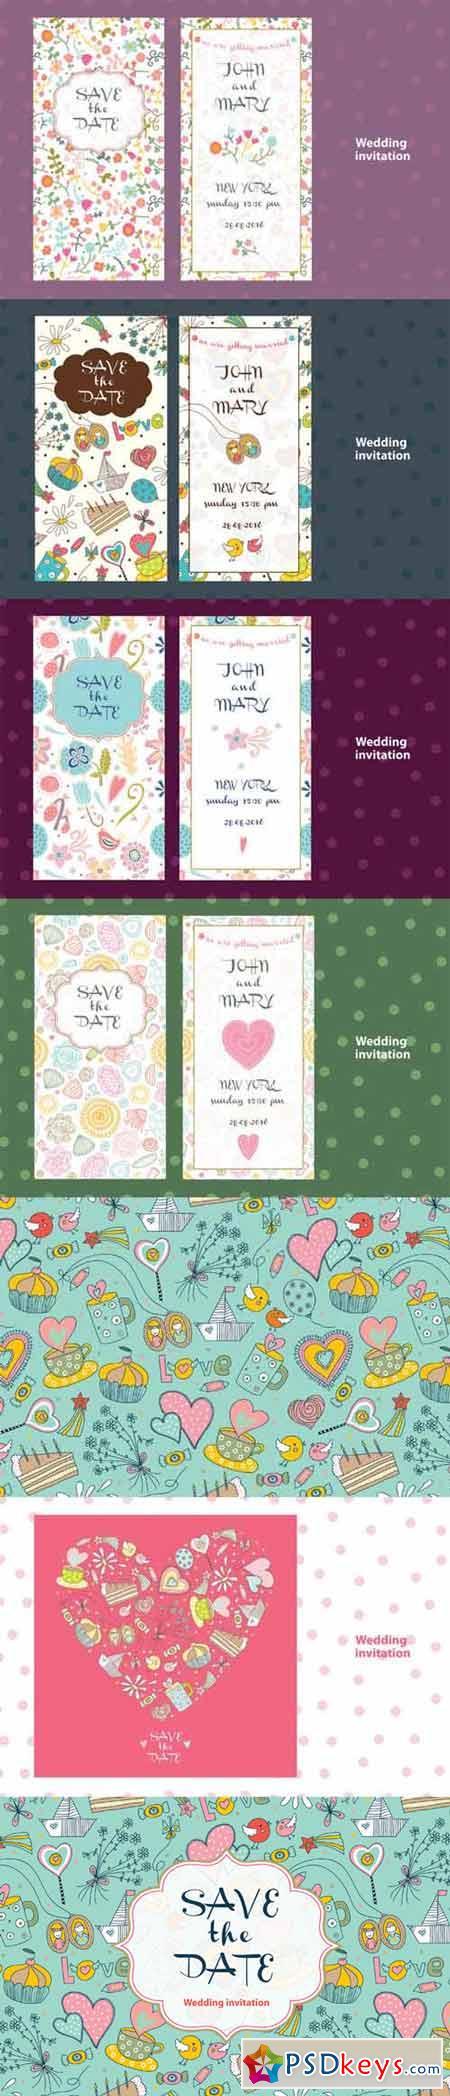 Wedding invitation 396573